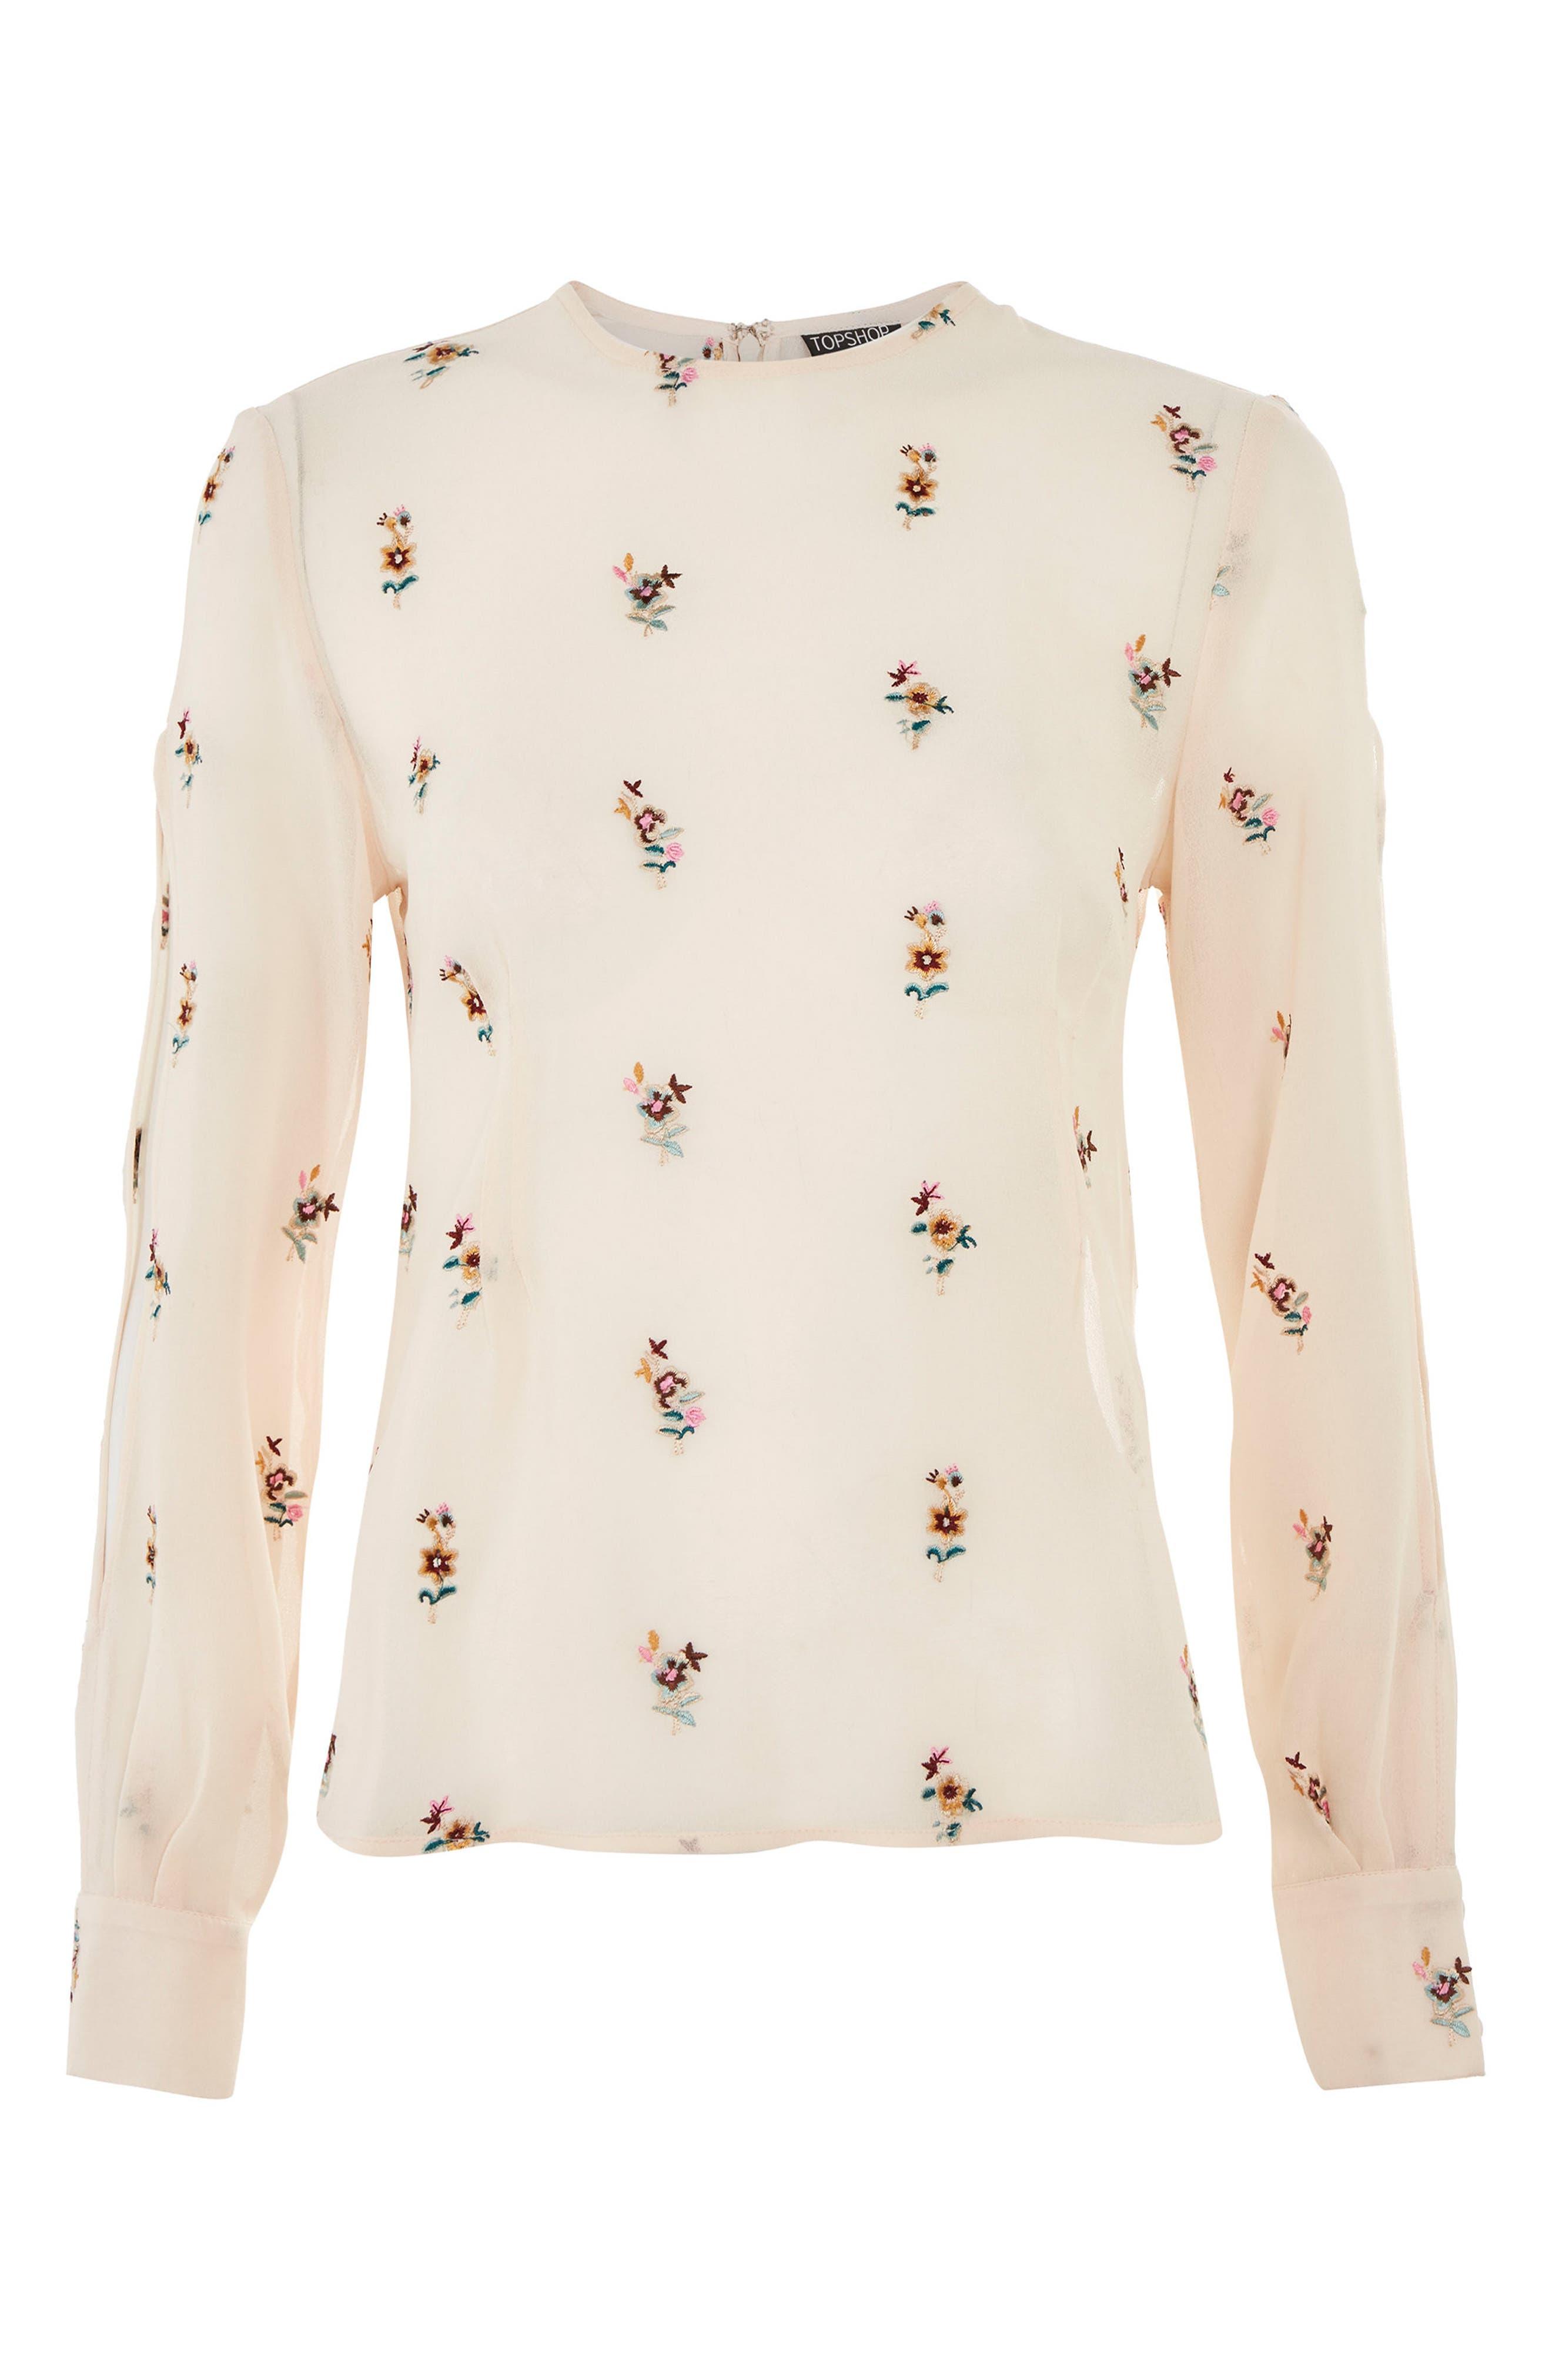 Main Image - Topshop Floral Embroidered Split Sleeve Top